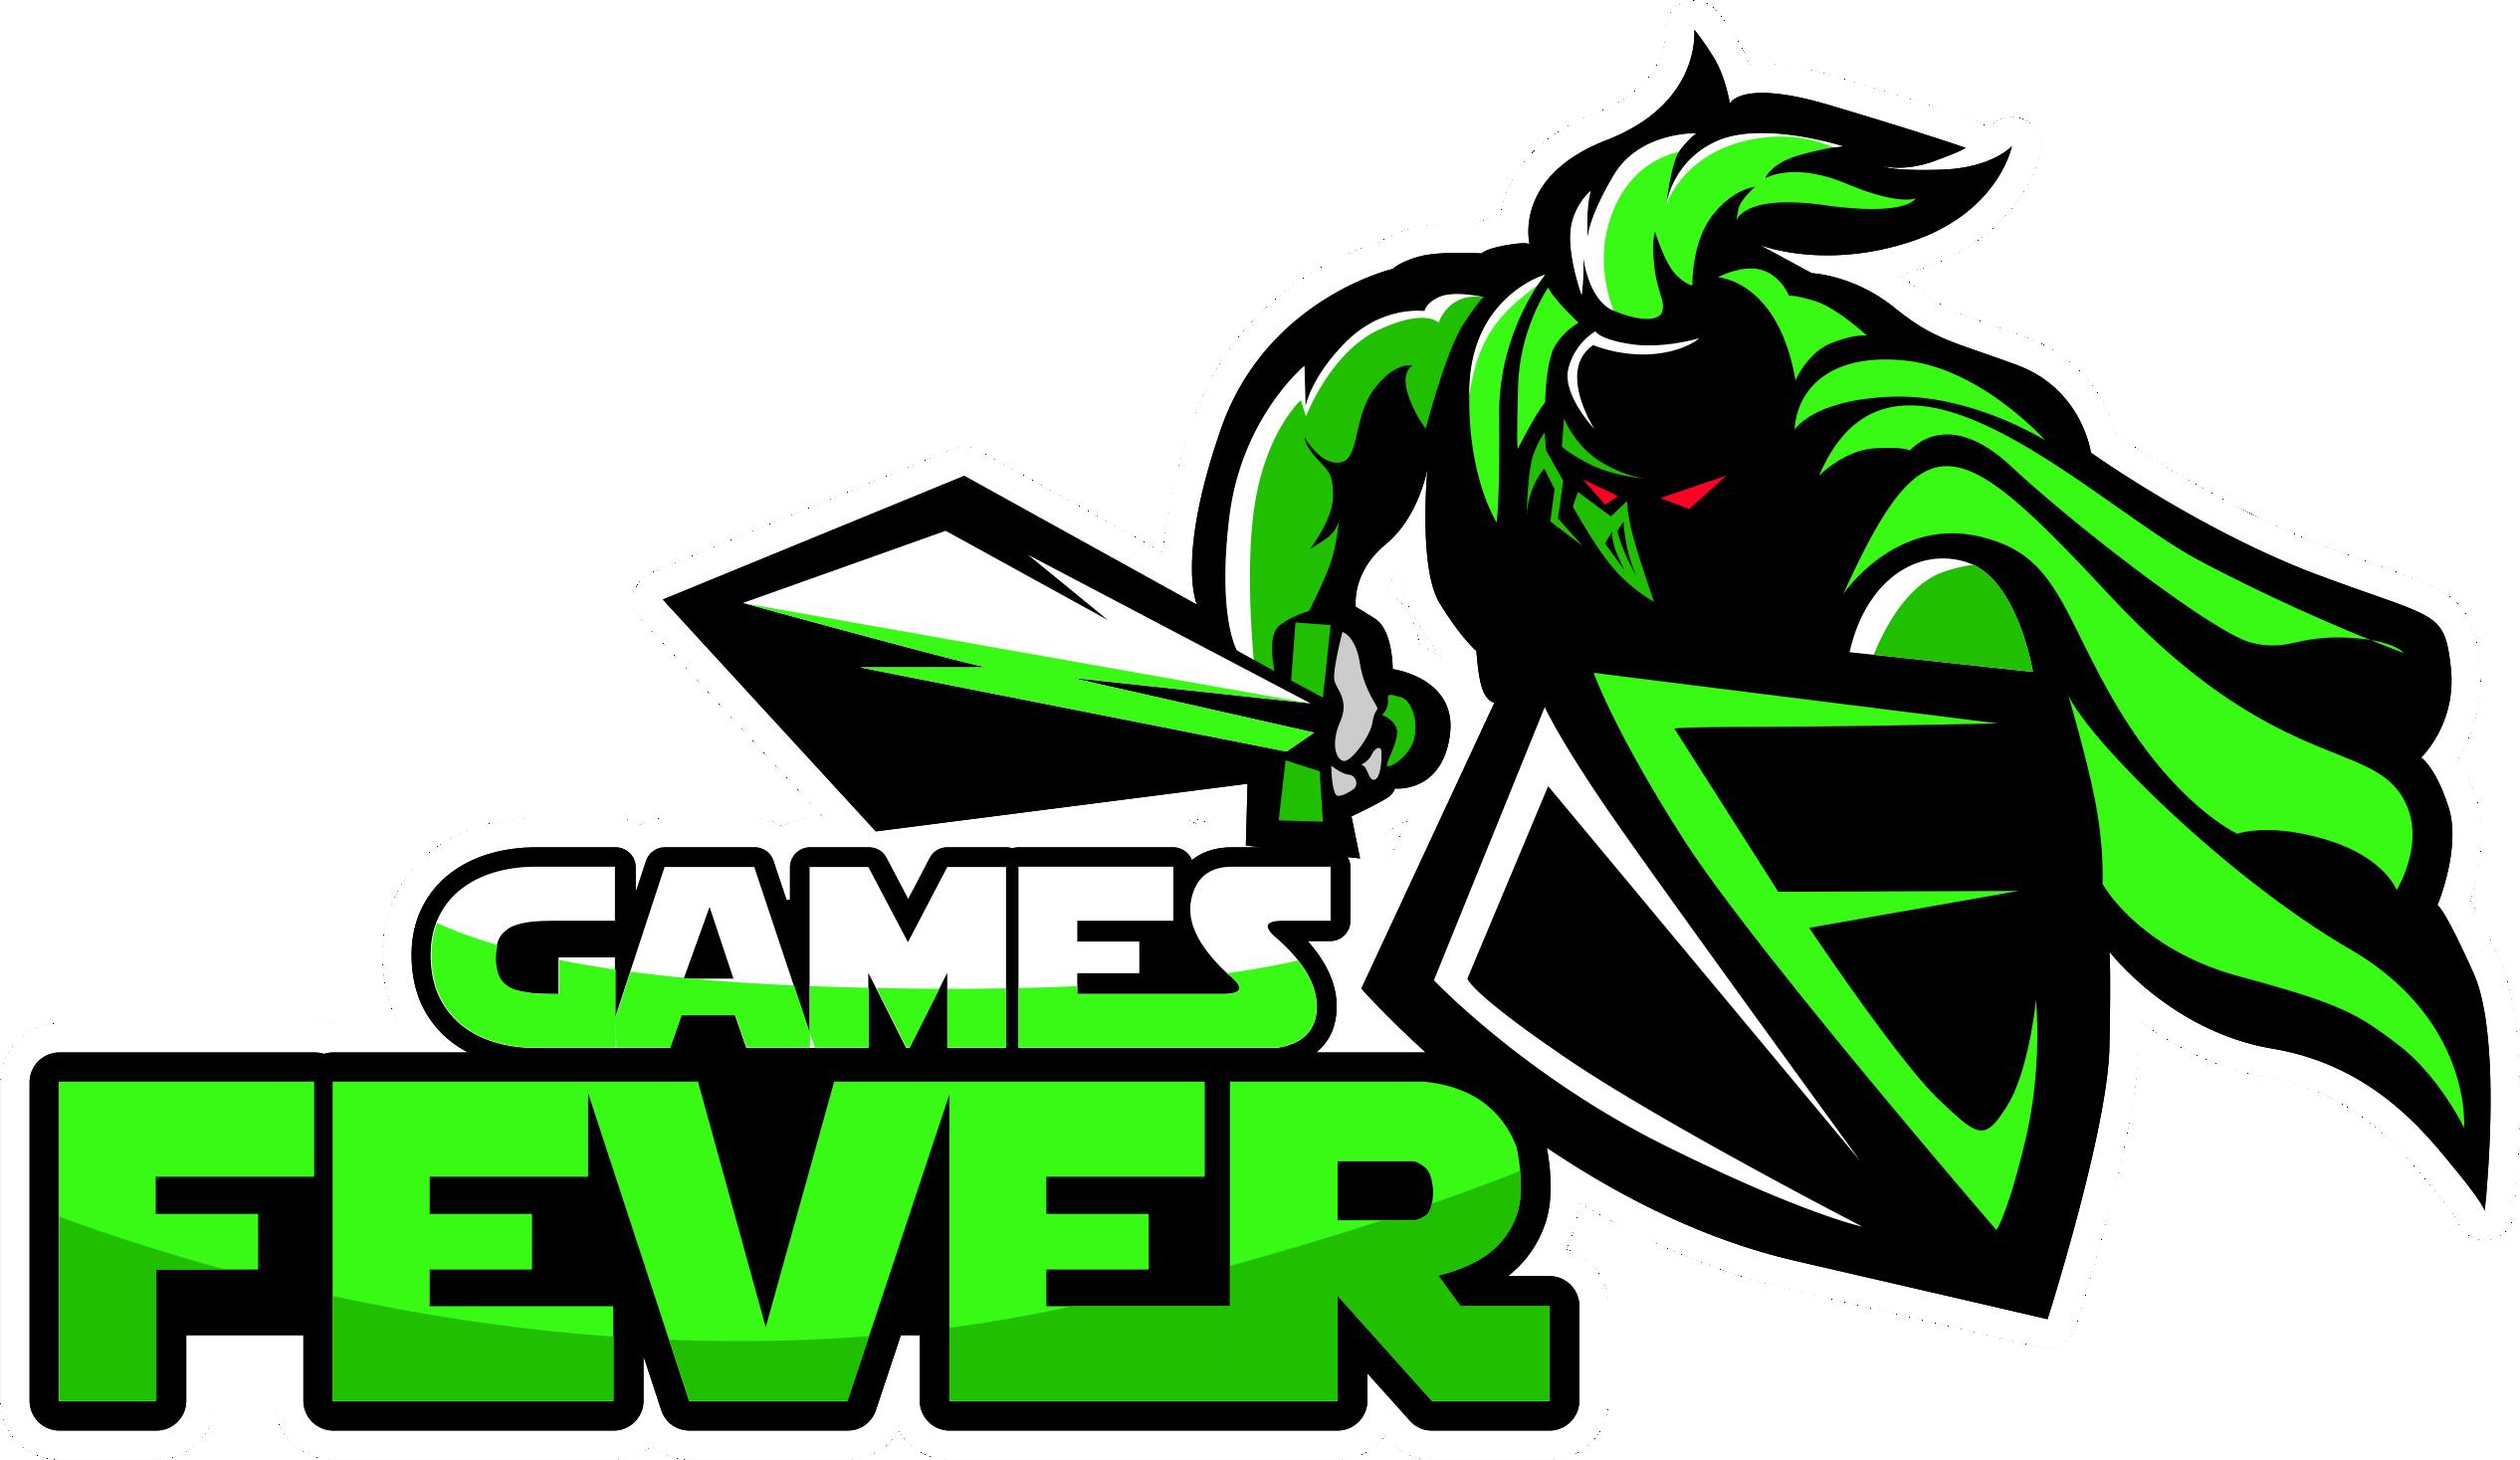 Gamesfever